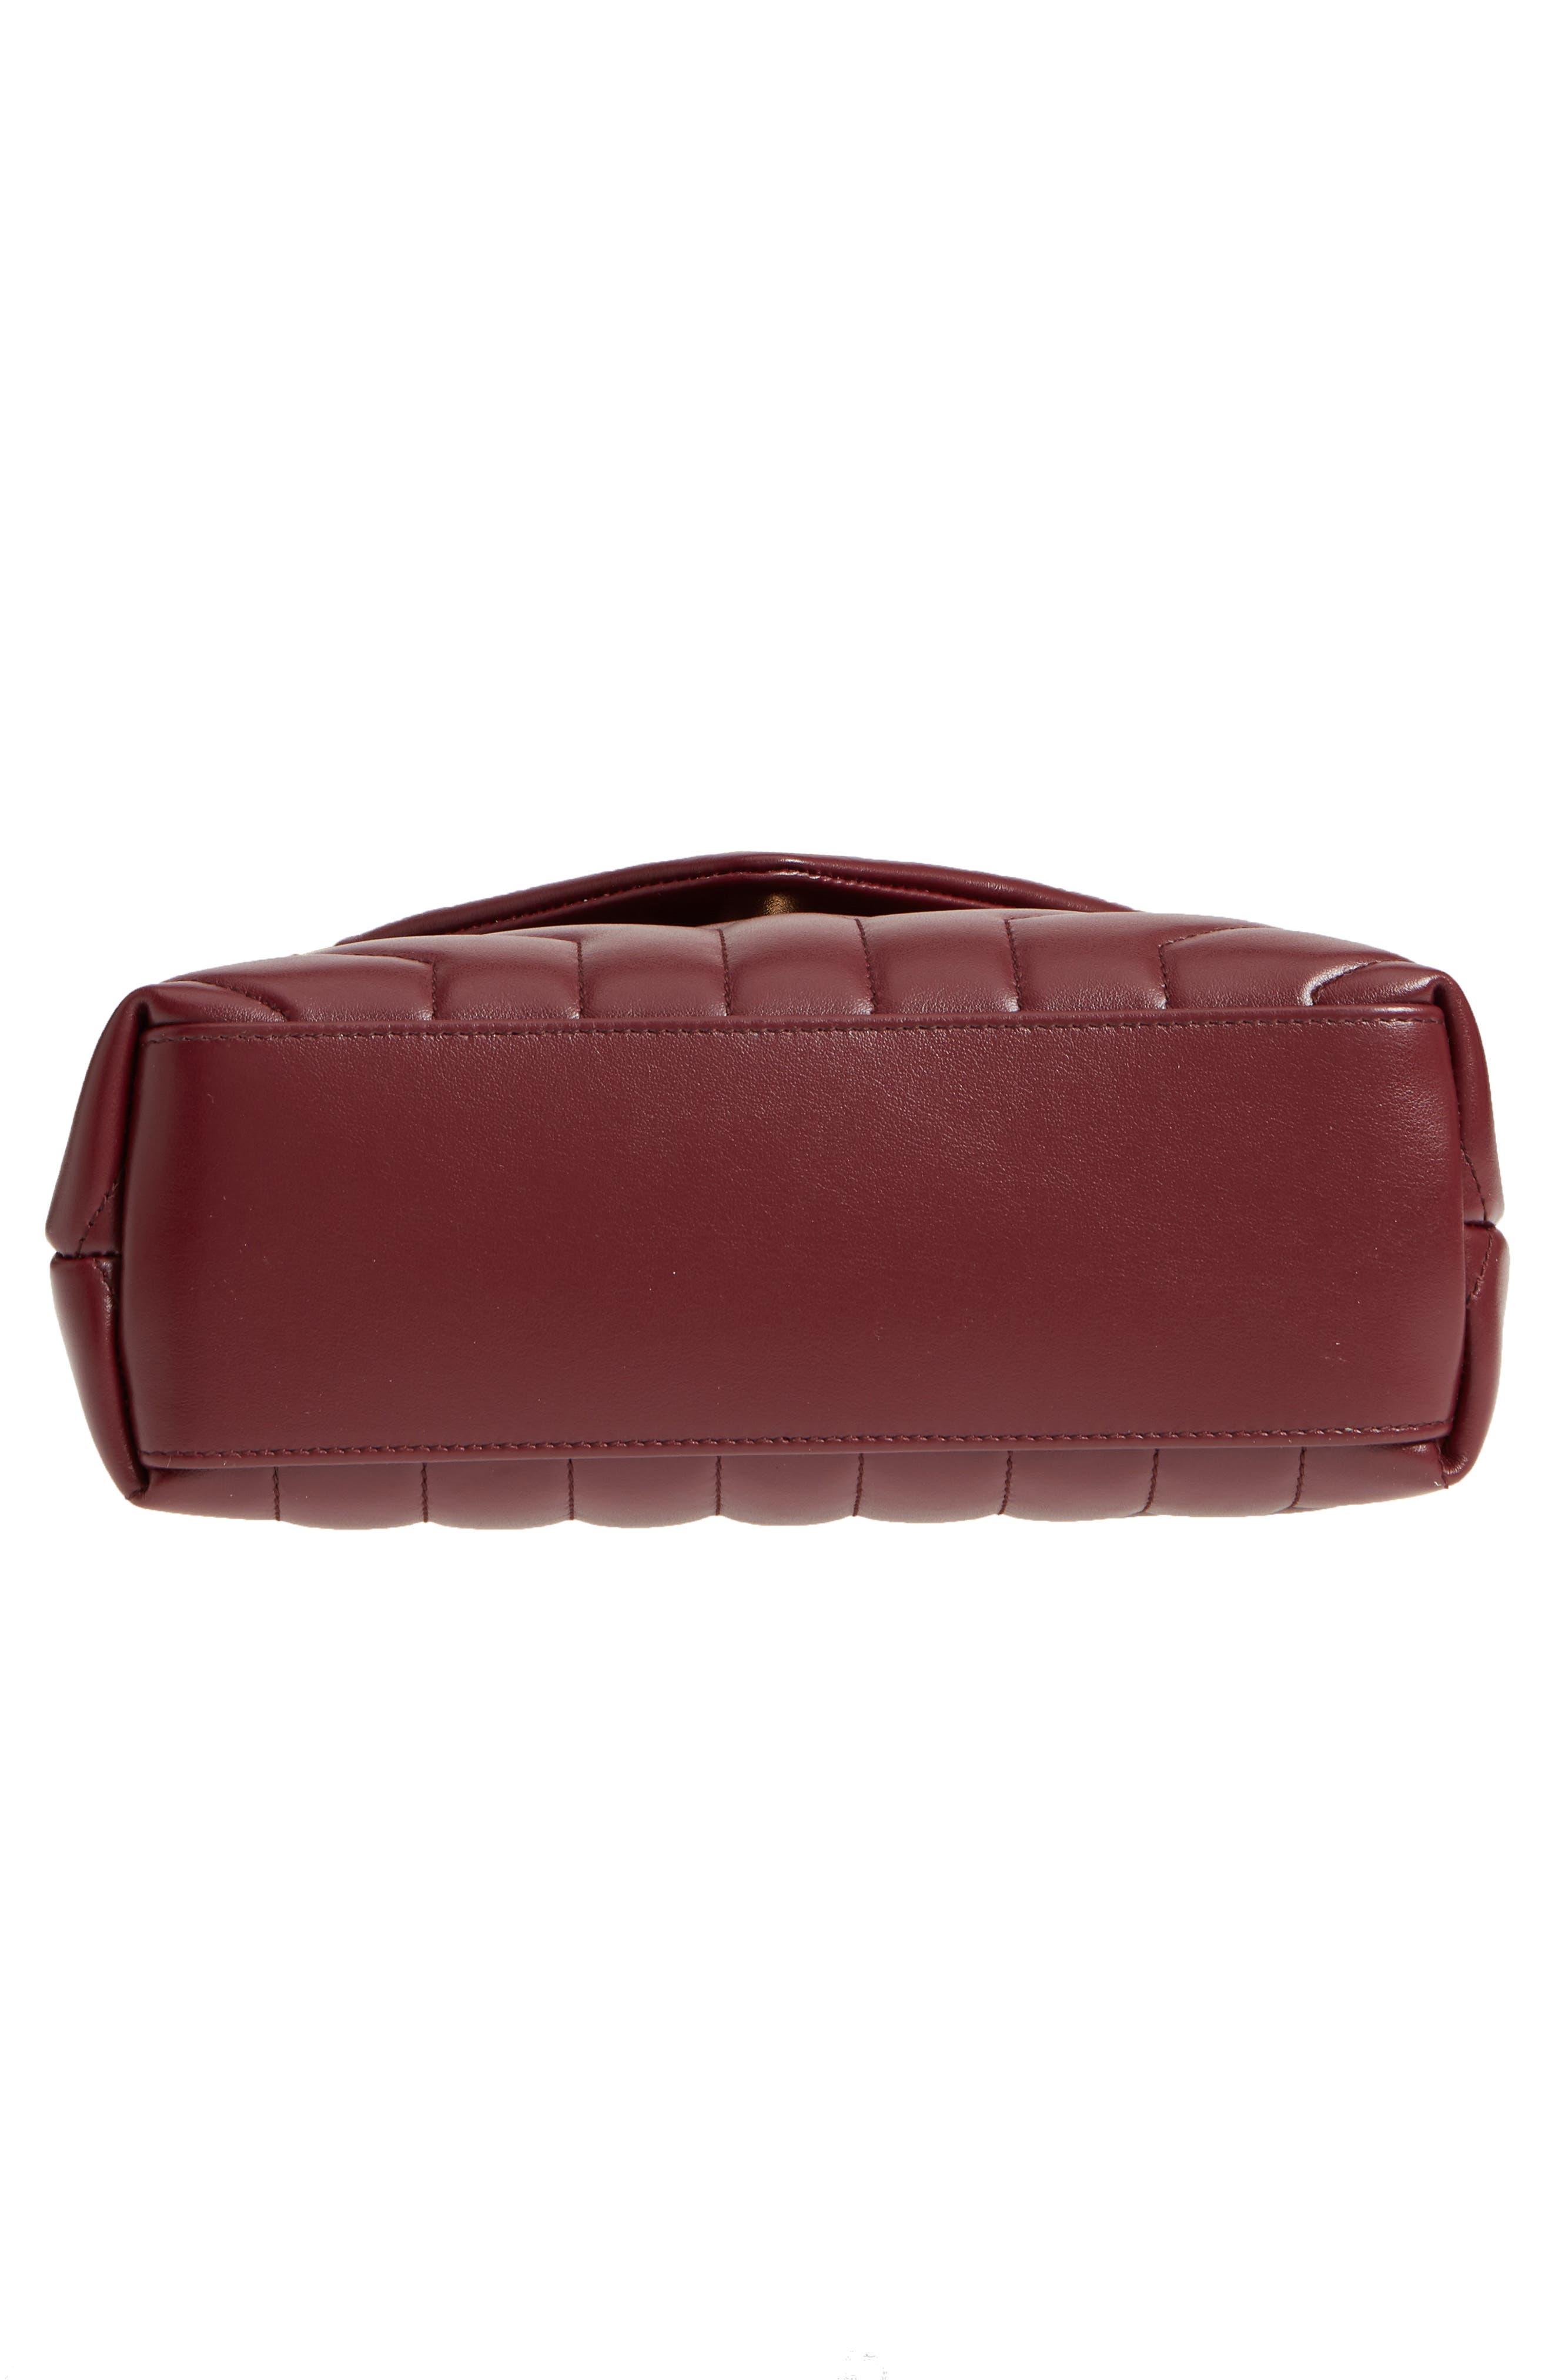 ,                             Small Loulou Leather Shoulder Bag,                             Alternate thumbnail 33, color,                             930